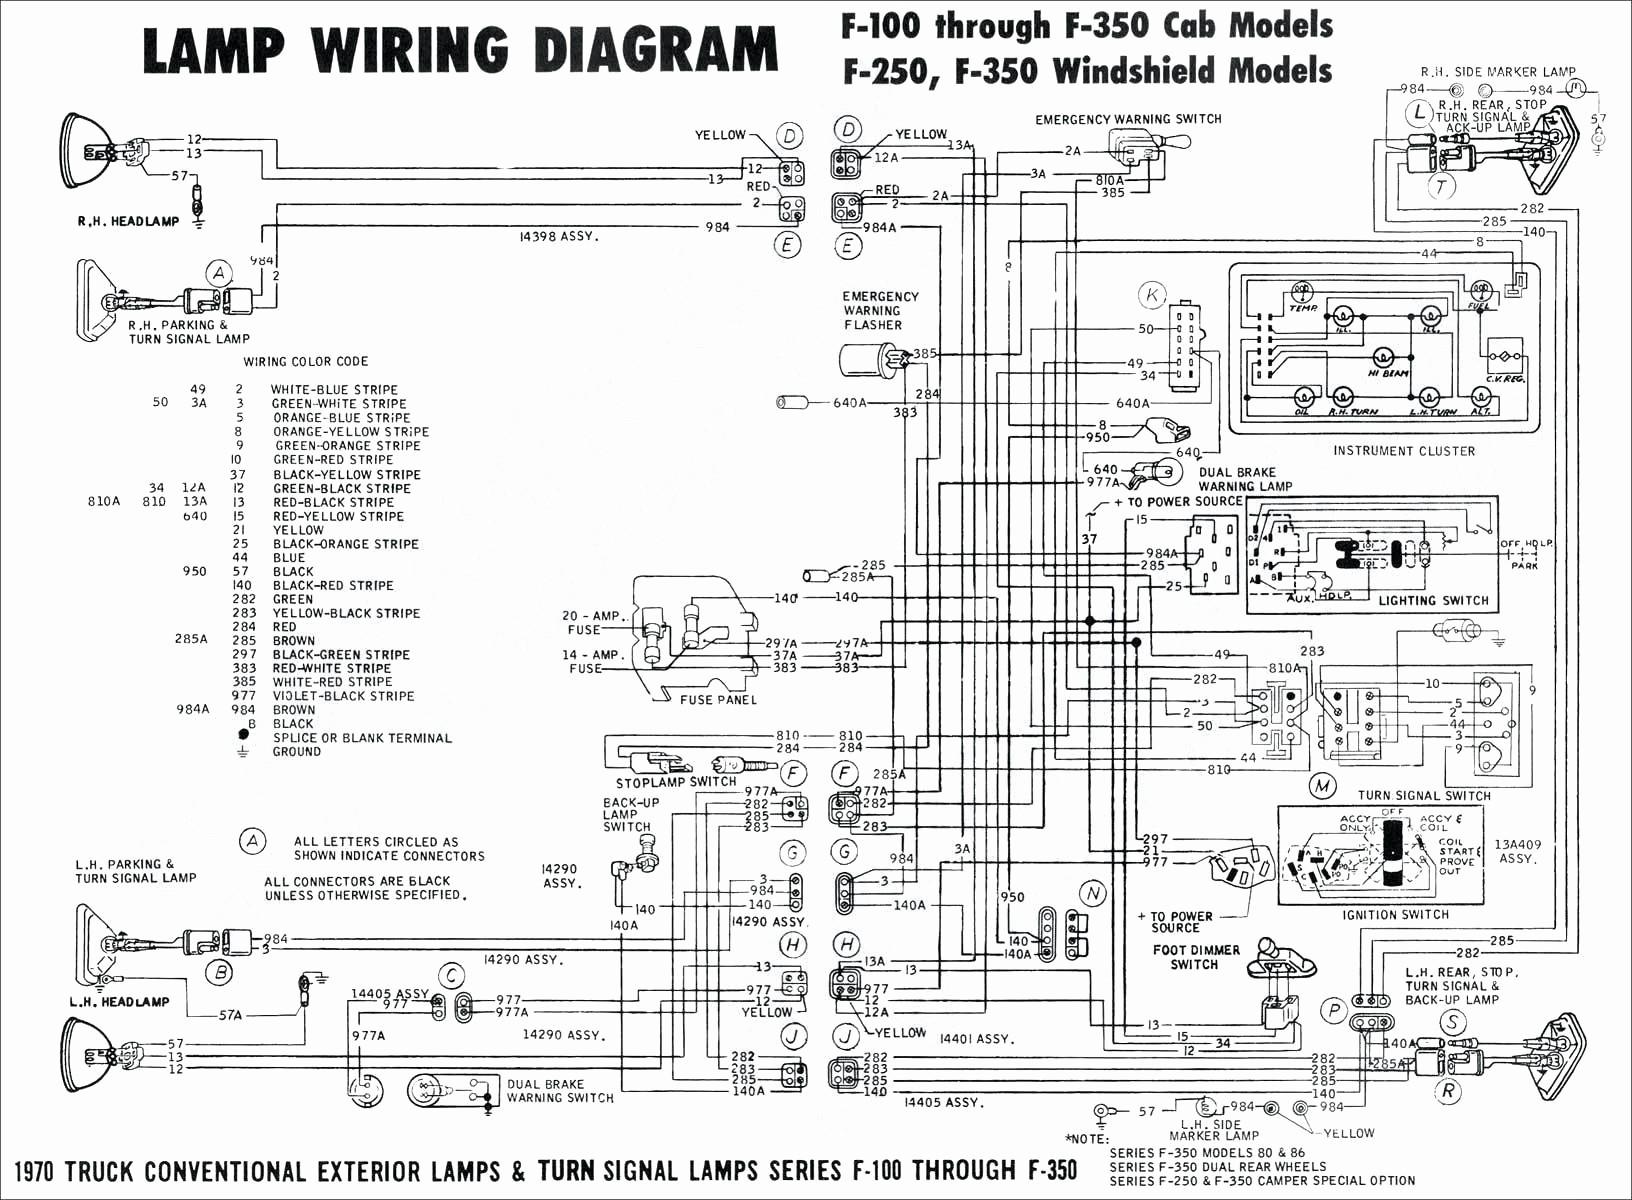 Ohv Engine Diagram Honda C70 Wiring Diagram S Valid Wiring